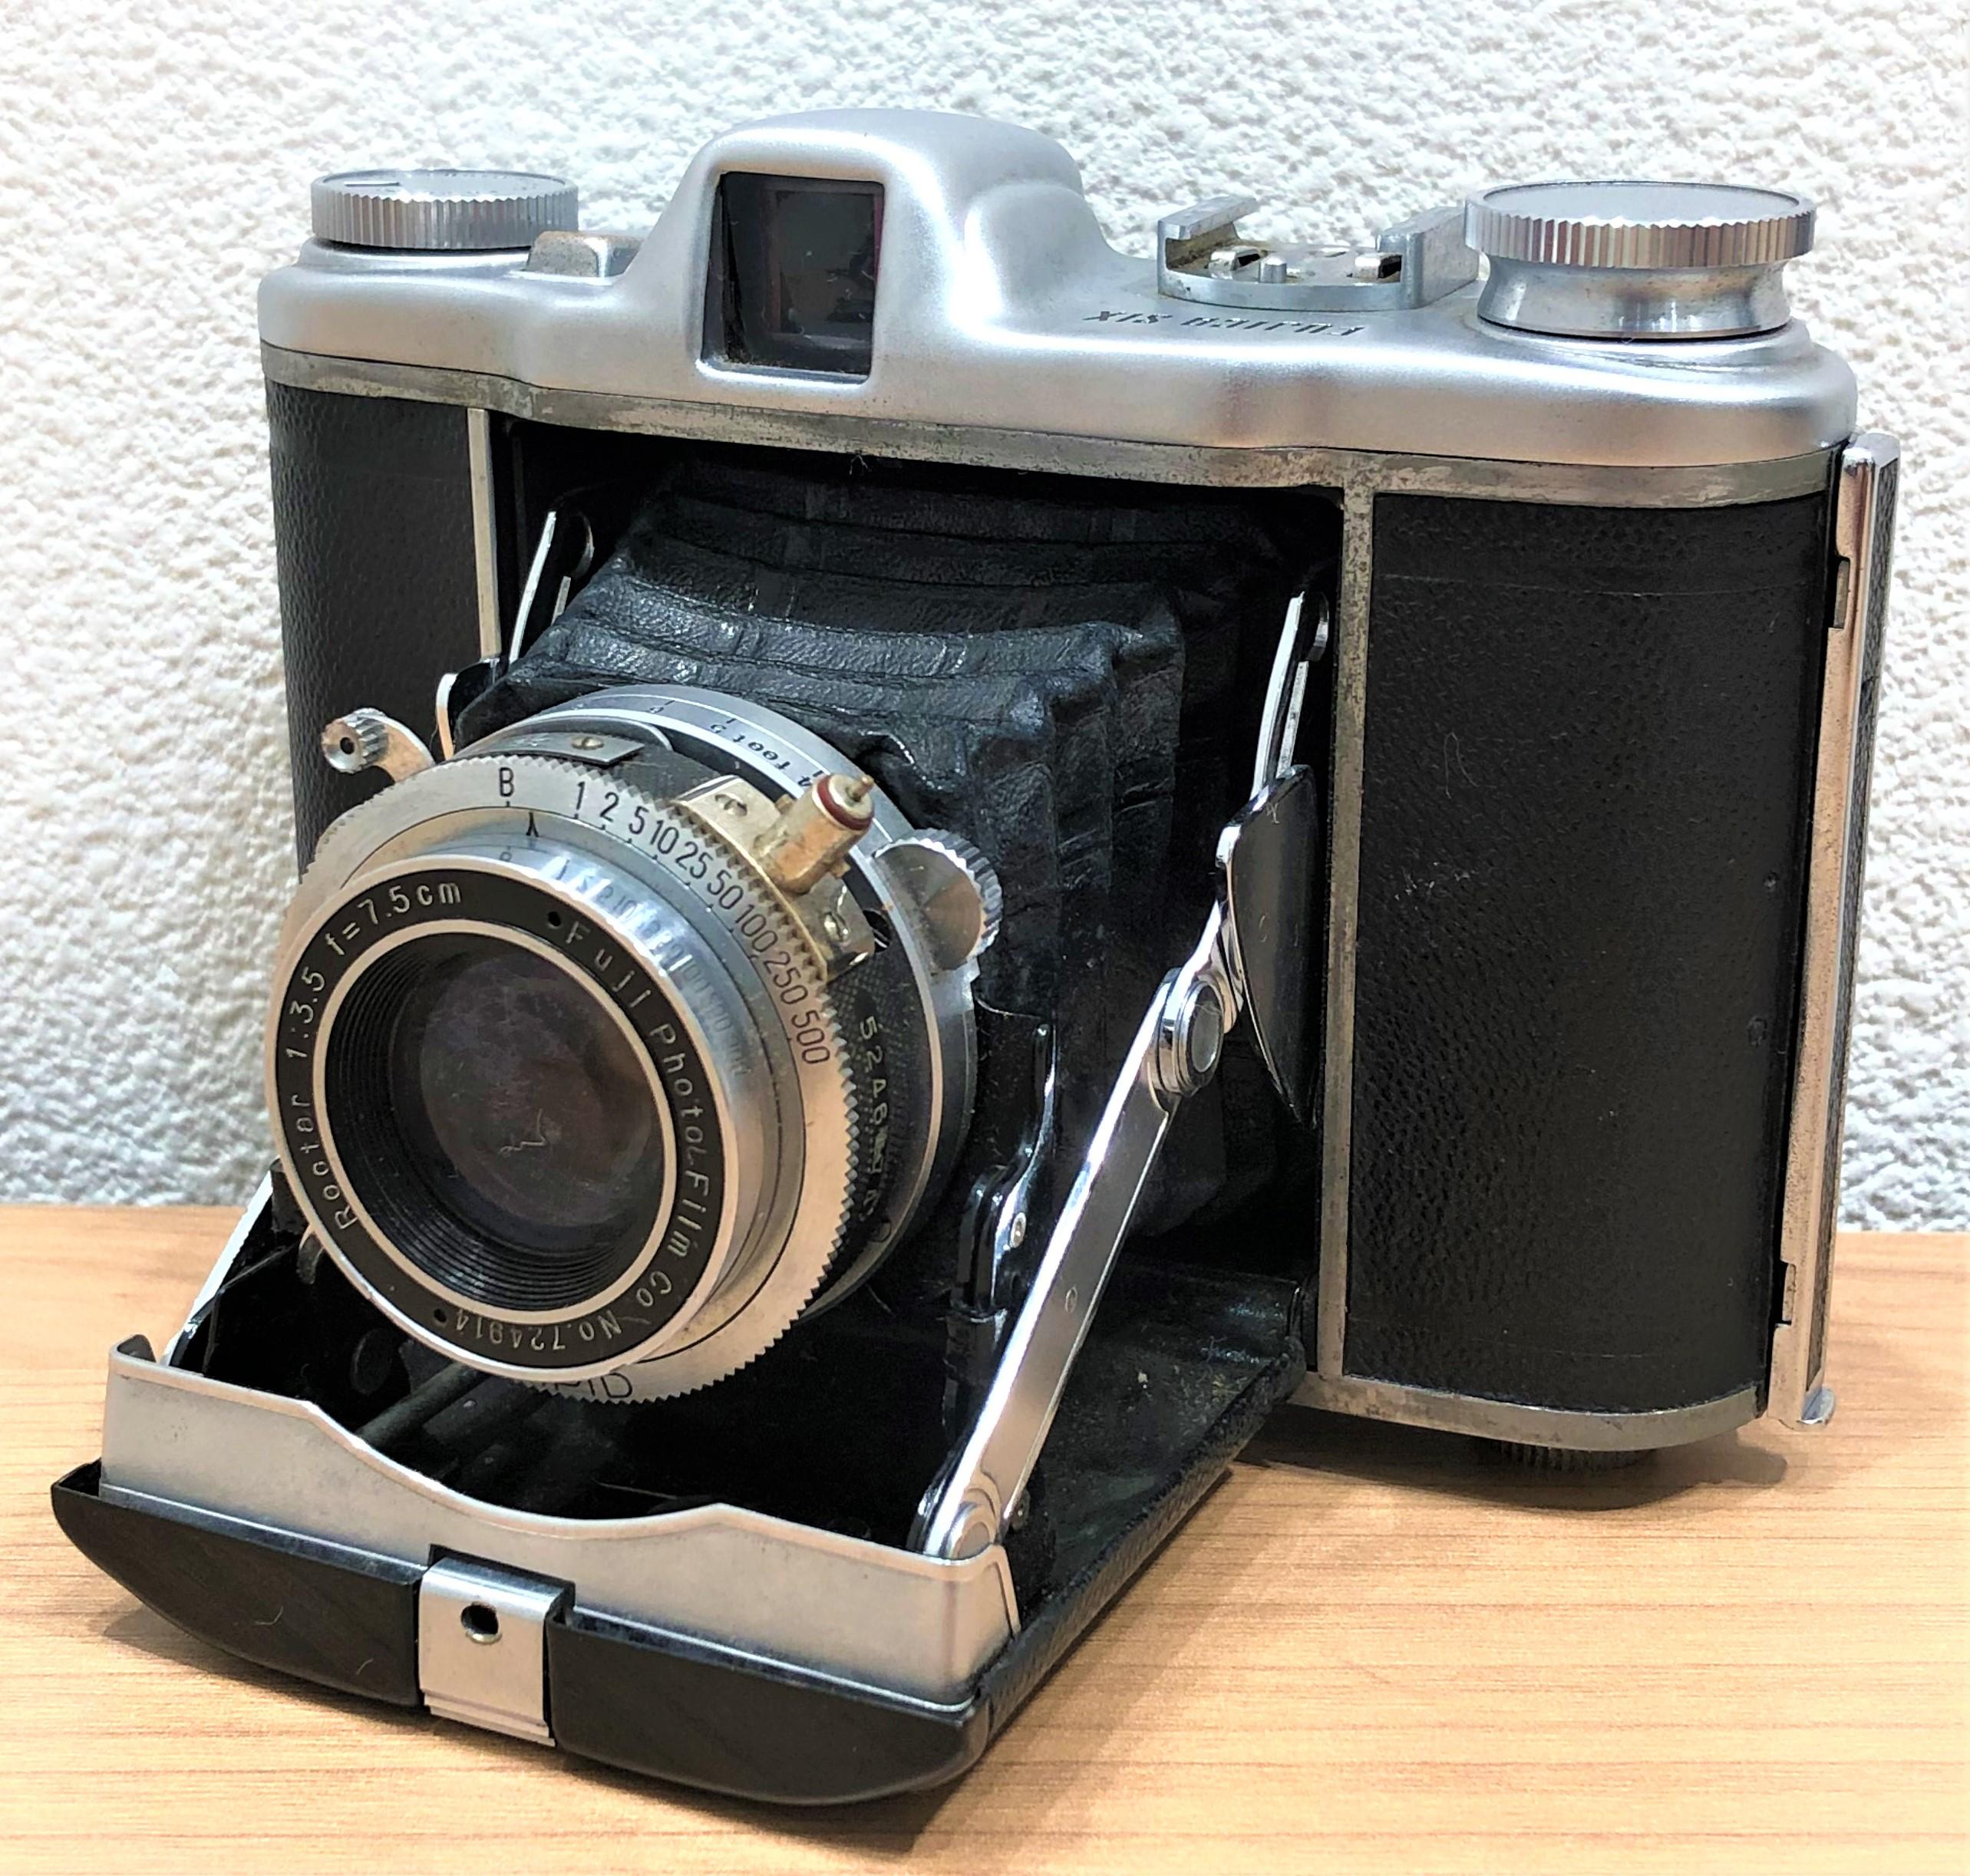 【FUJICA/フジカ】SIX 13.5 f=7.5cm カメラ